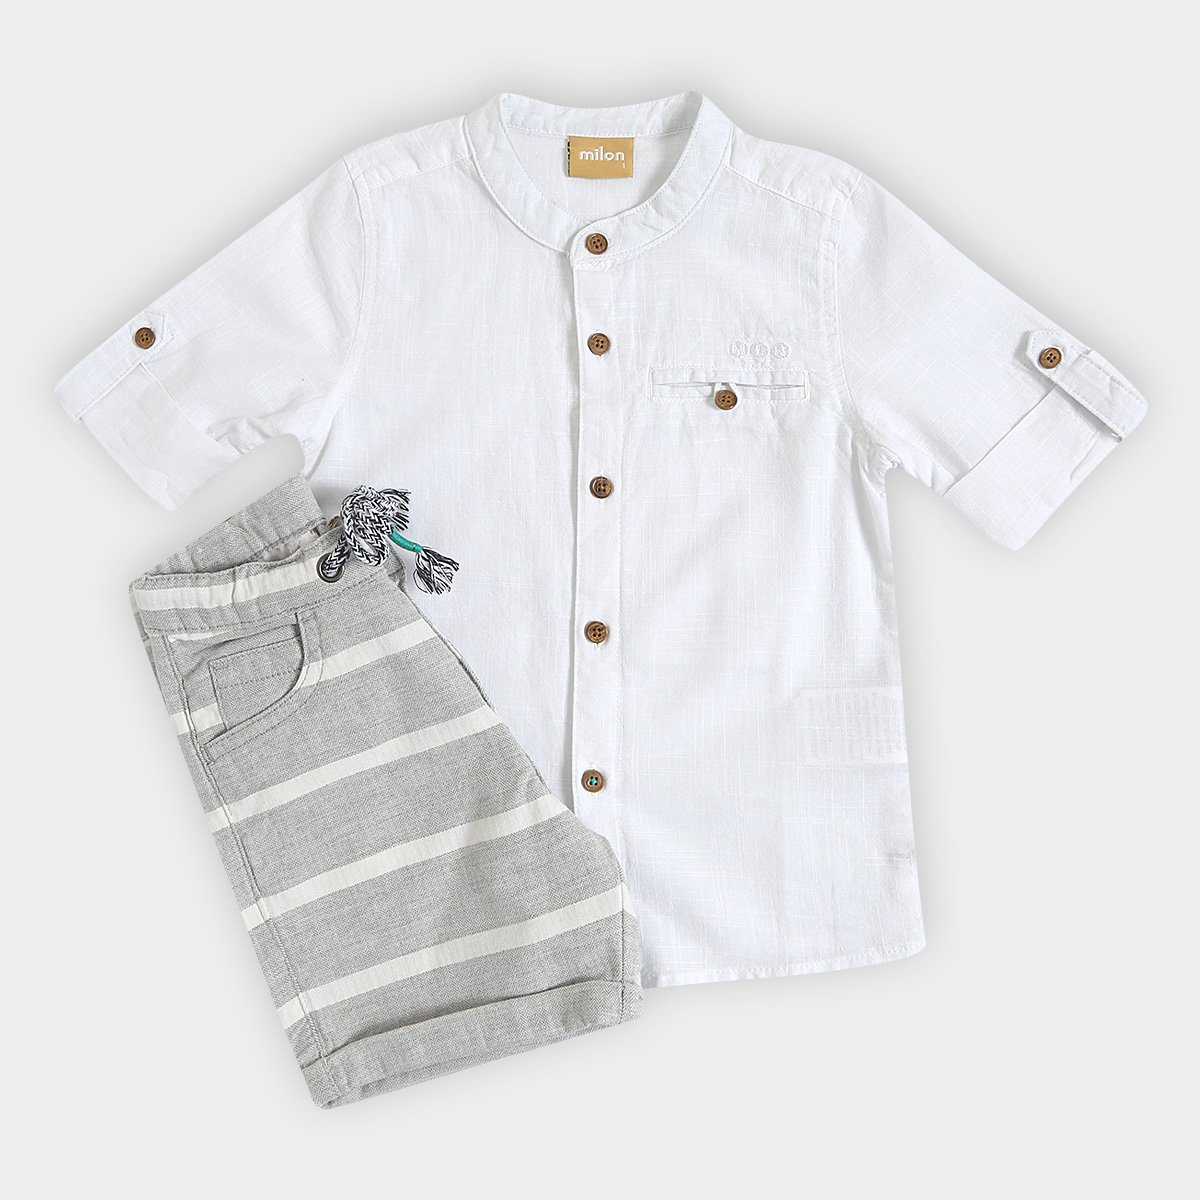 63c543b3399552 Conjunto Infantil Milon Camisa Tricoline e Bermuda Masculino - Branco